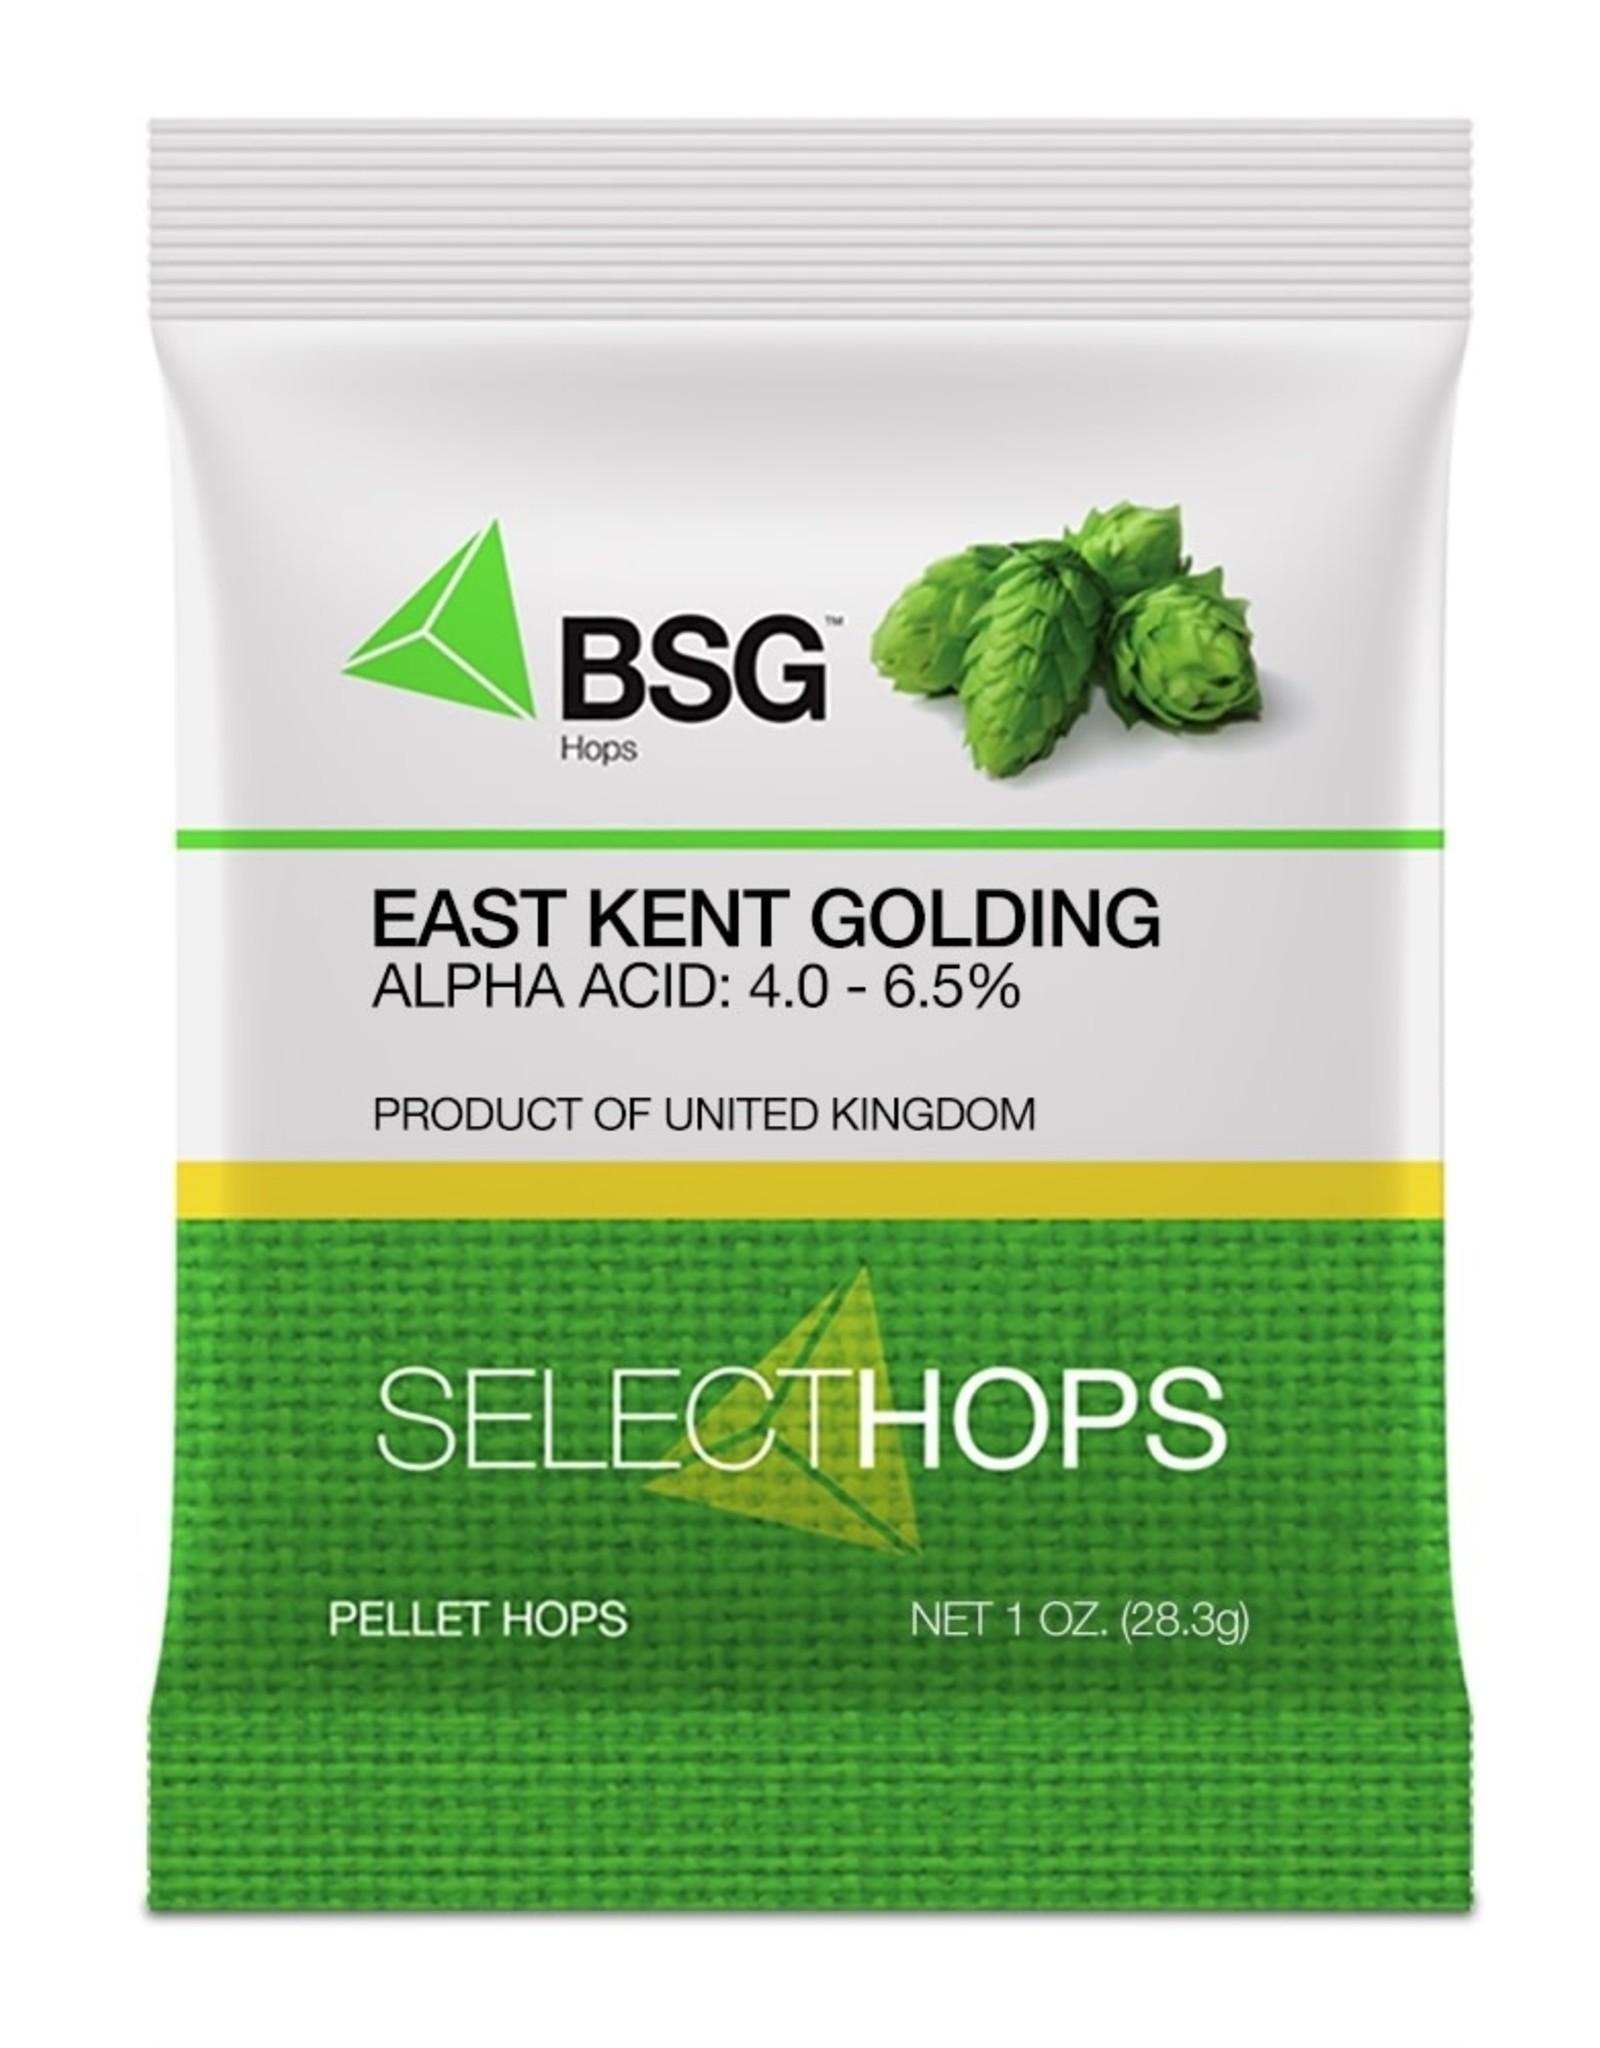 EAST KENT GOLDING Hop Pellets- 1 oz.